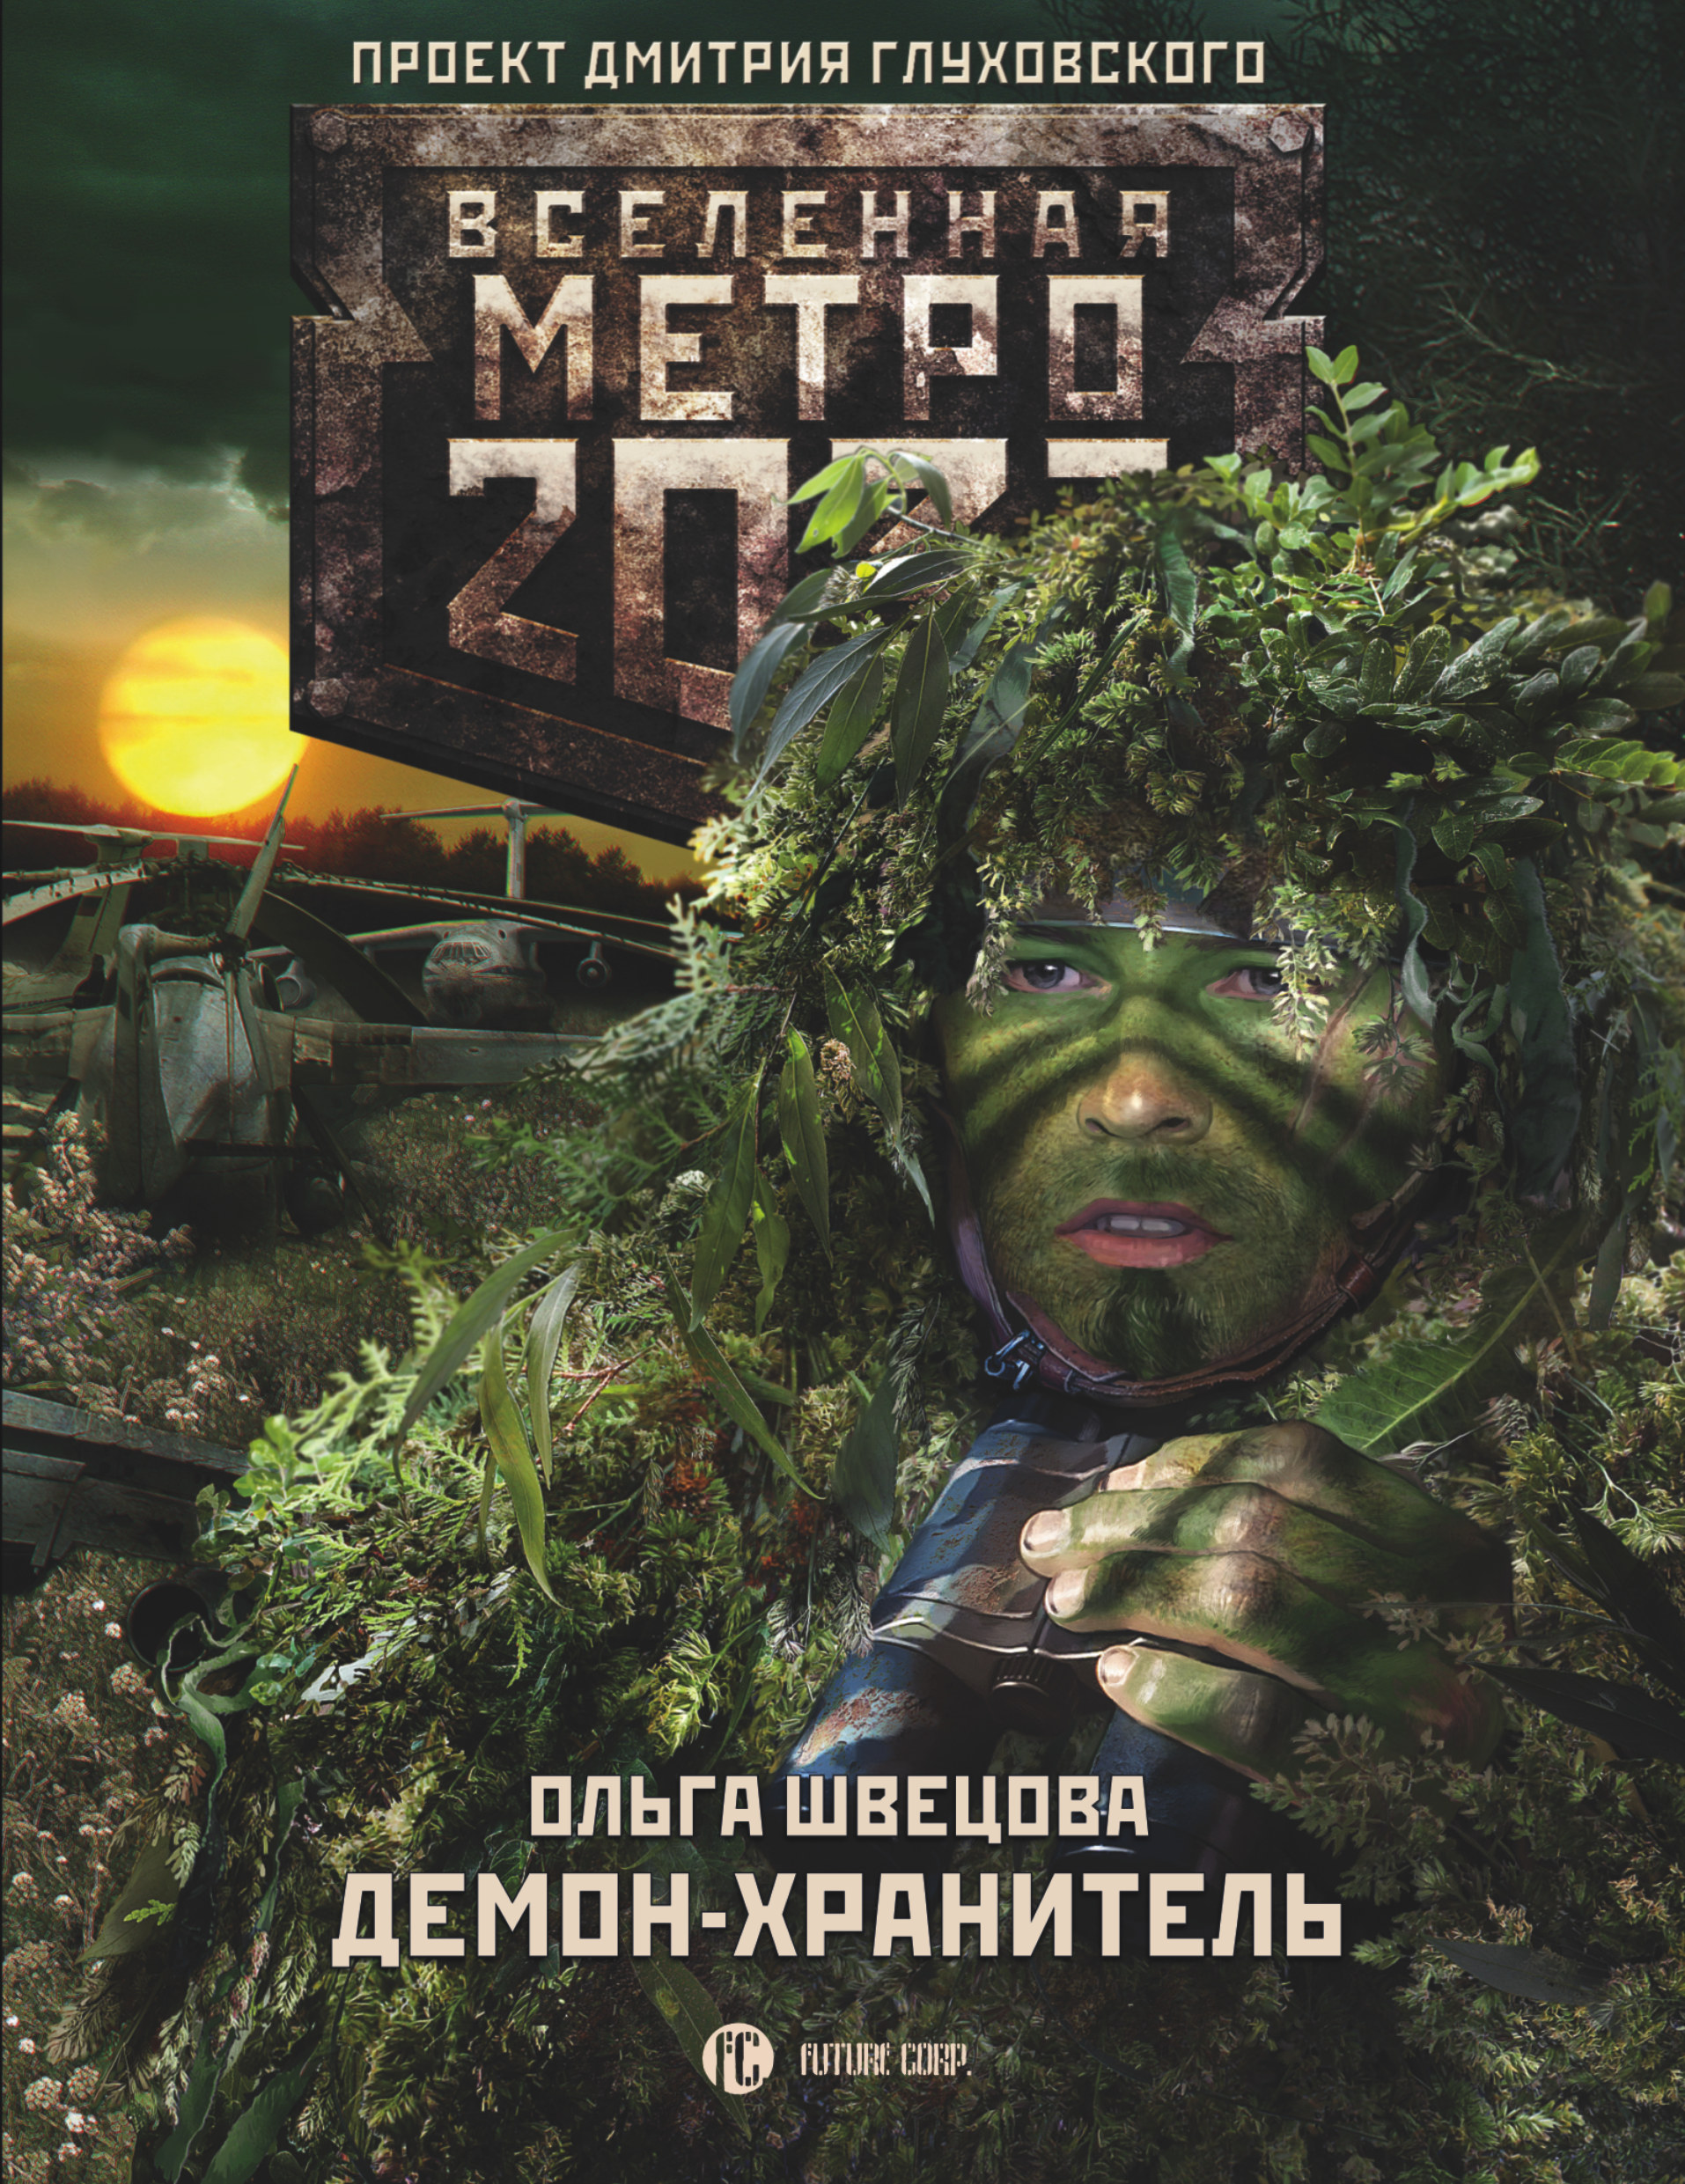 Швецова О.С. Метро 2033: Демон-хранитель осипов и в метро 2033 лешие не умирают